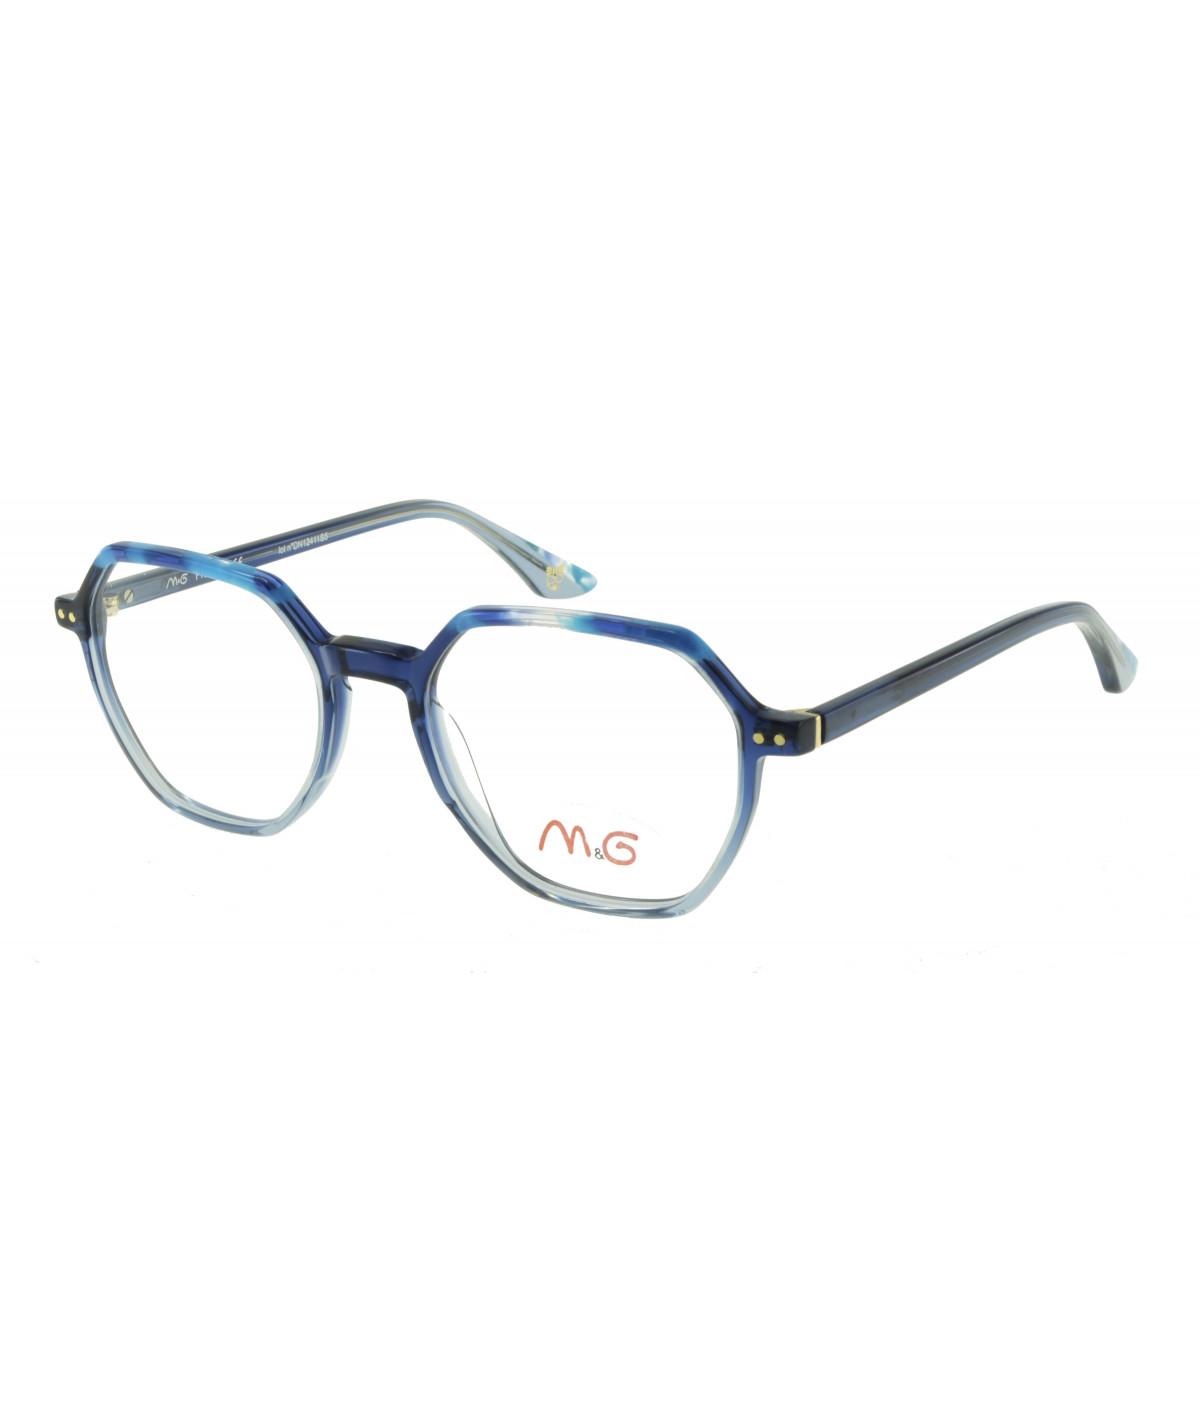 MG688_1